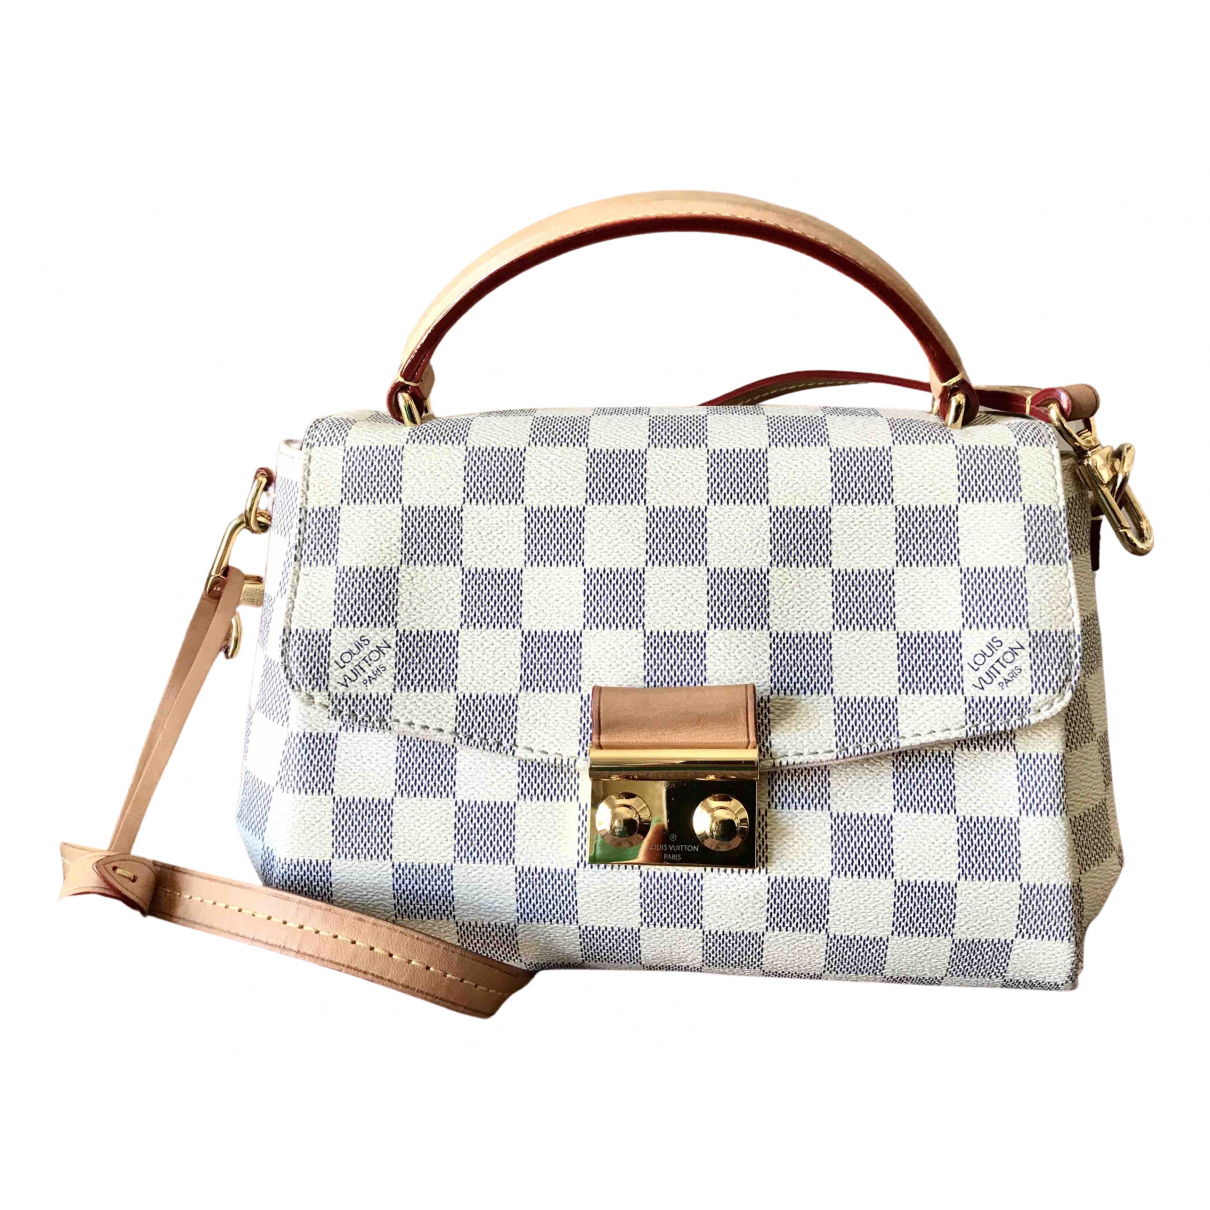 Louis Vuitton Croisette Handtasche in  Bunt Leinen